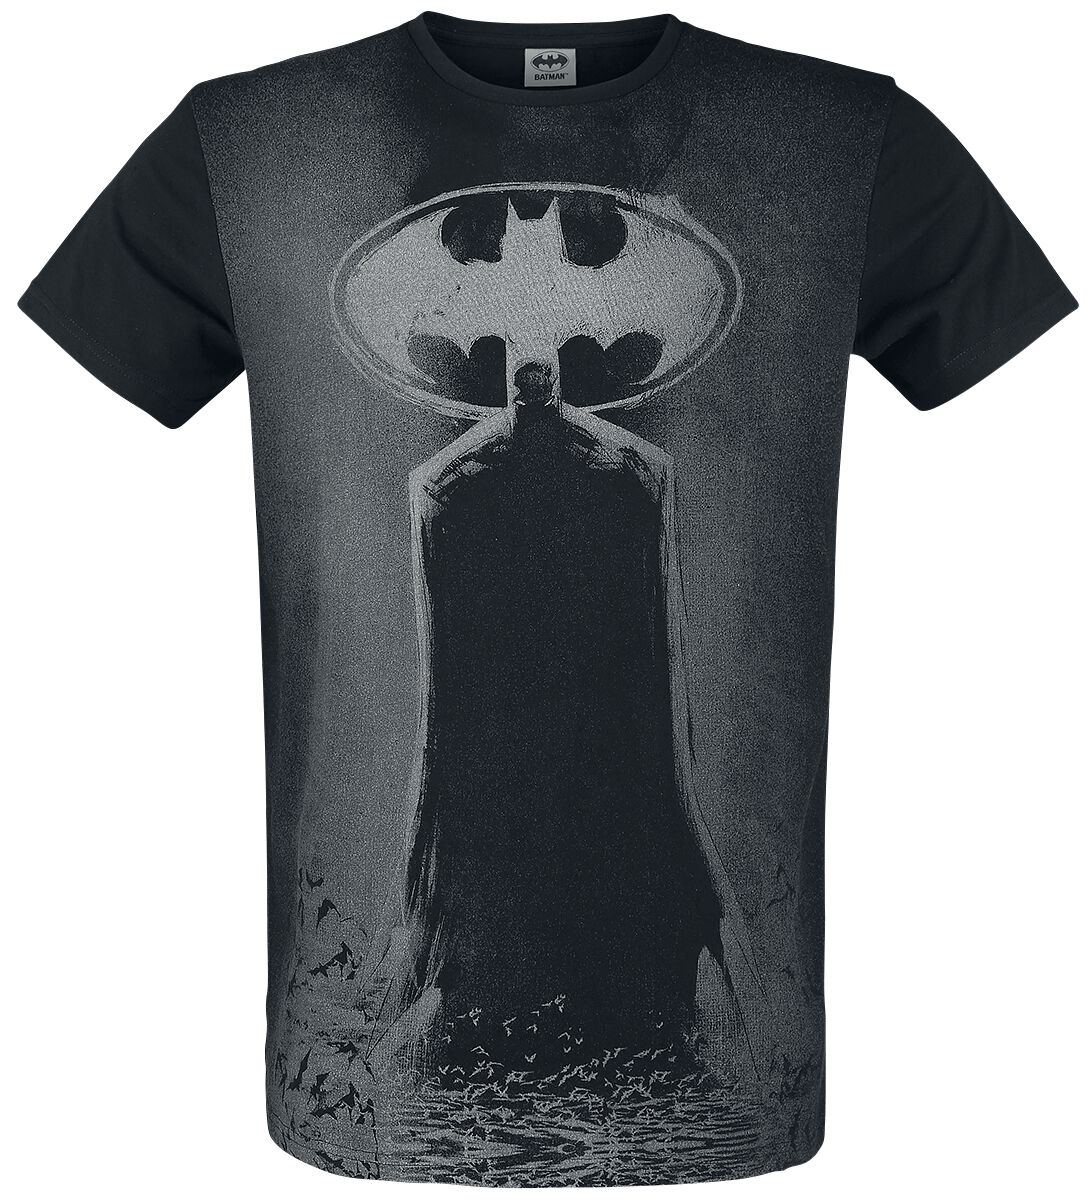 Image of   Batman Silhouette T-Shirt sort